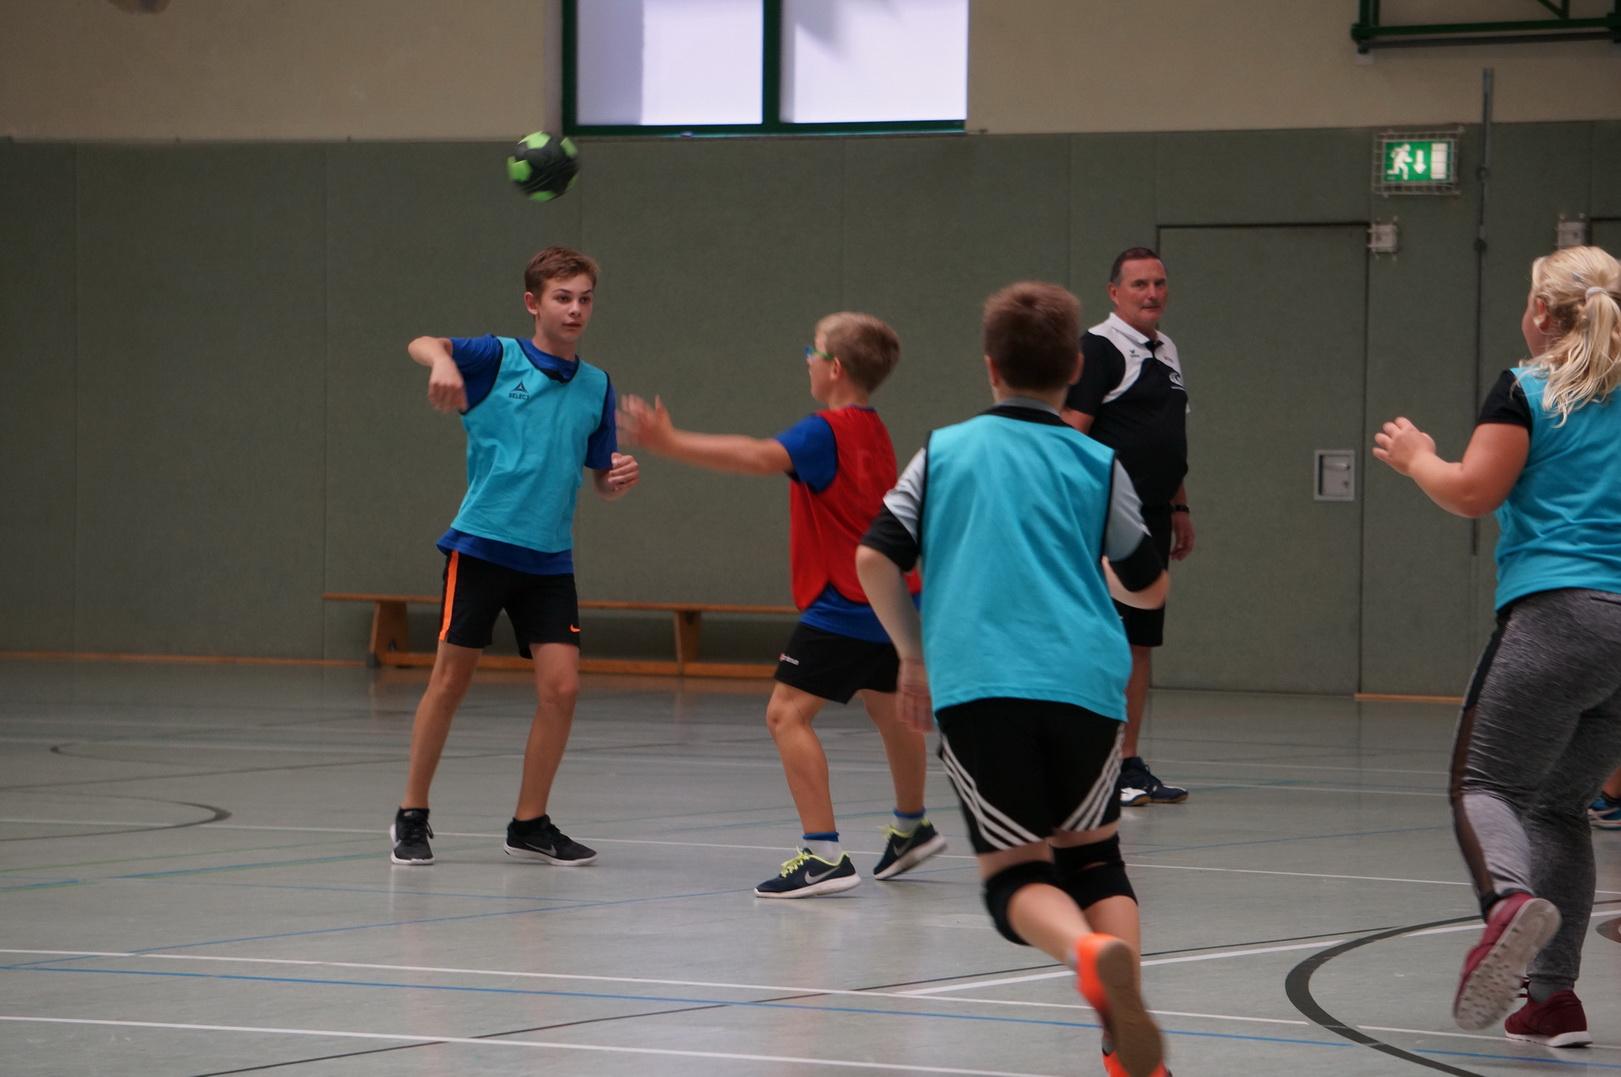 201808_Handballcamp_SDH_MG_271w